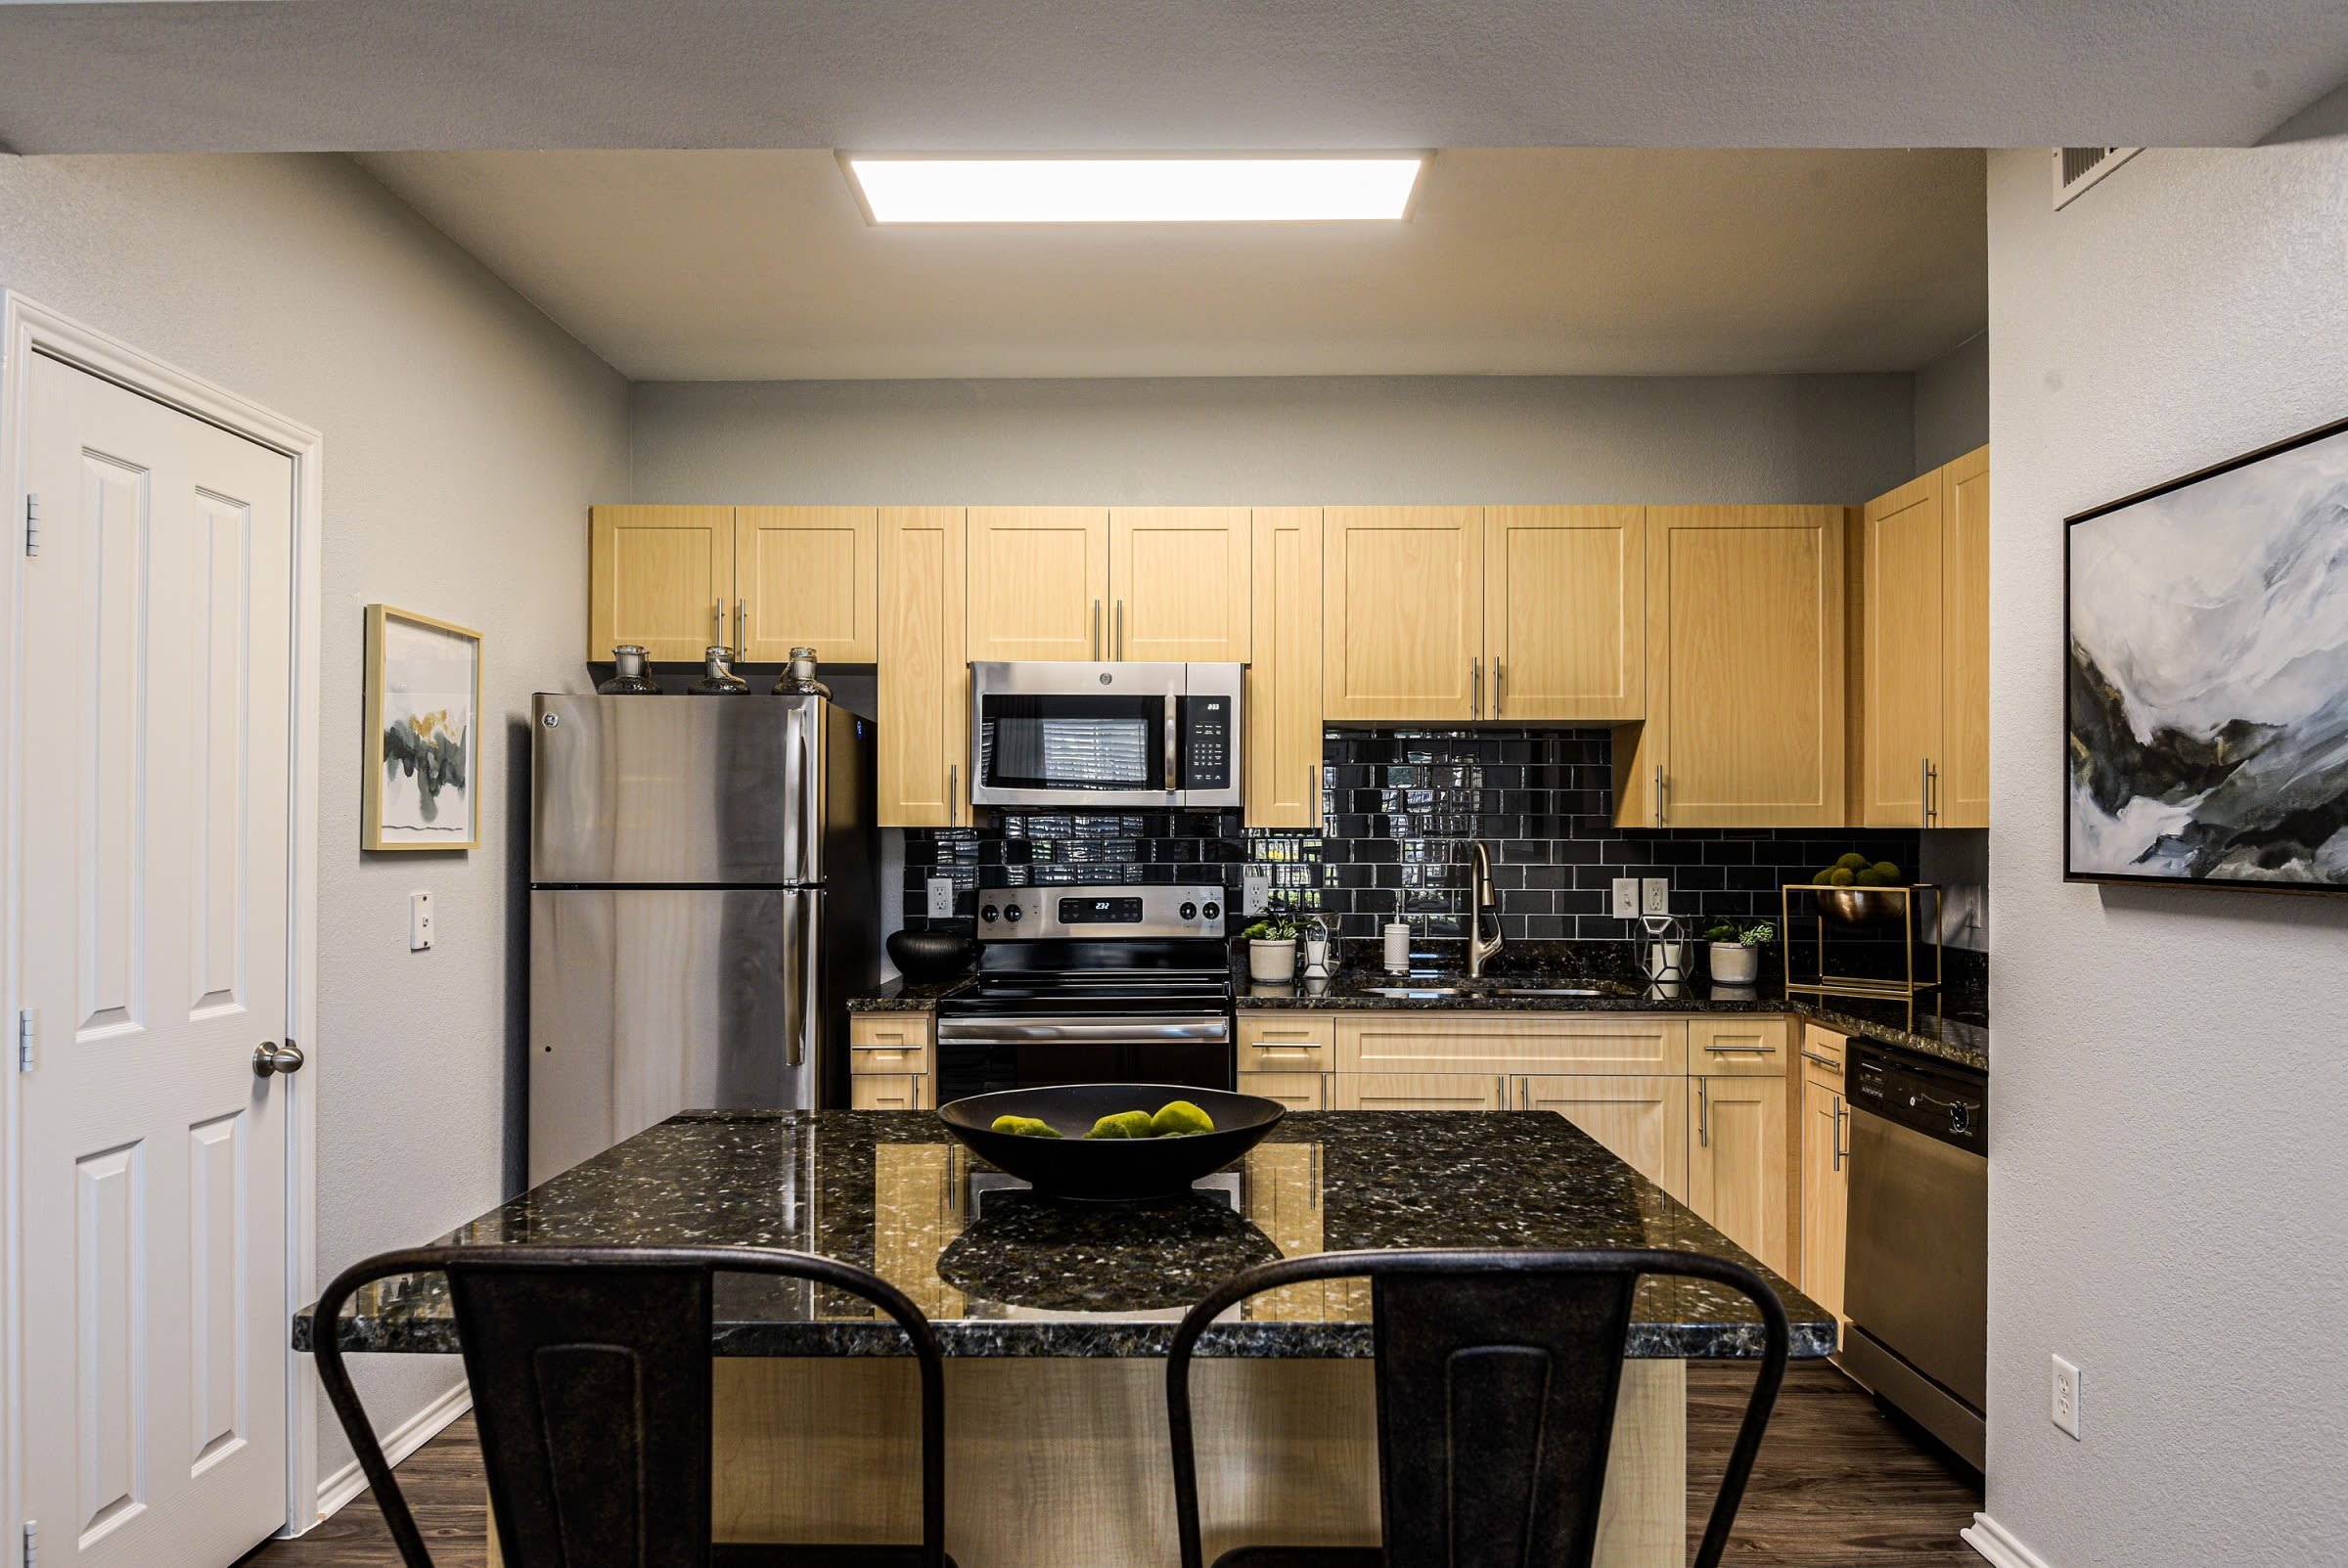 Granite countertop kitchen with island for bar seating at Ranch ThreeOFive in Arlington, Texas